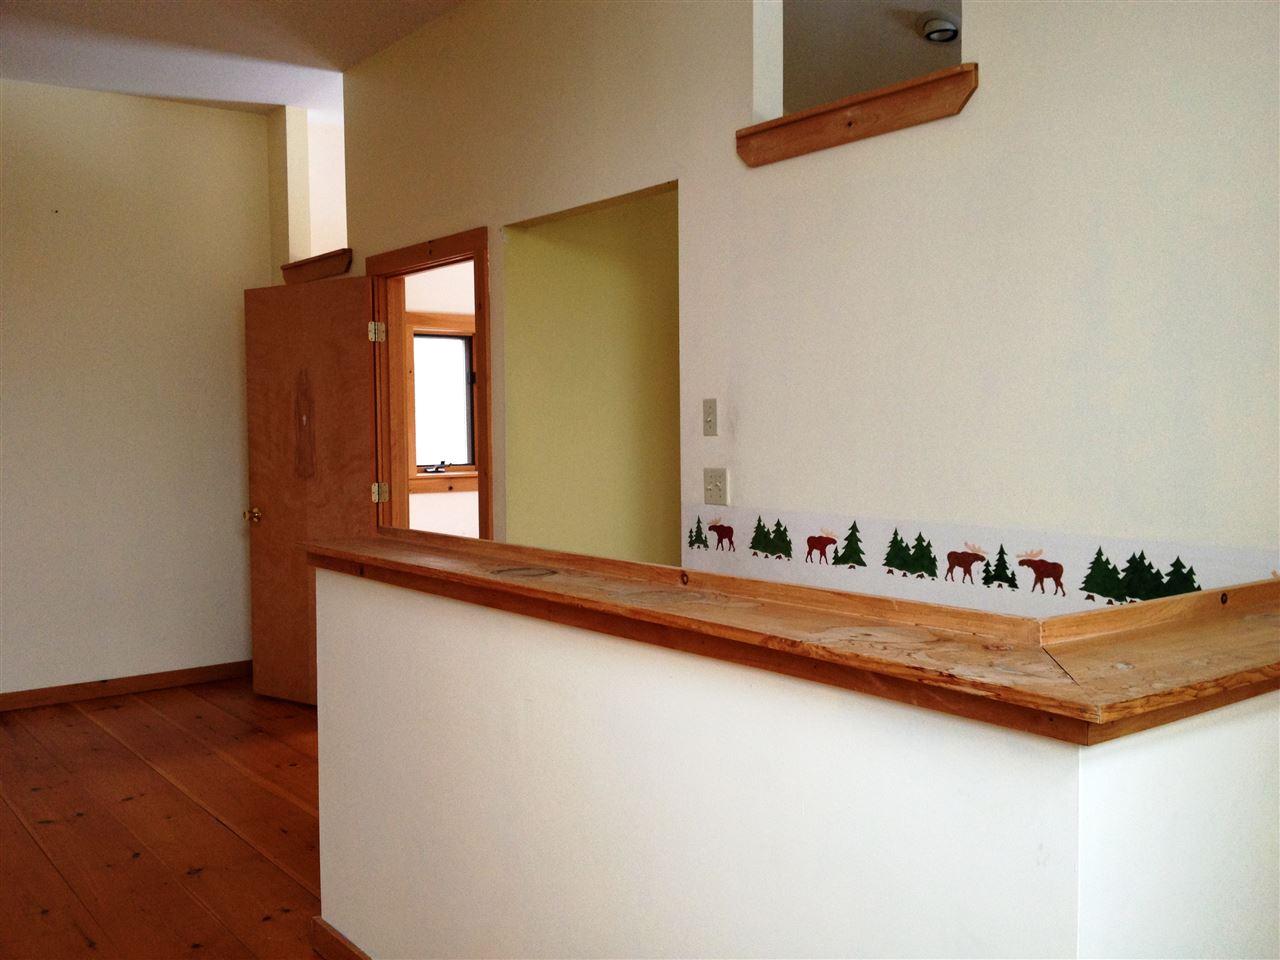 Mount-Snow-Real-Estate-4460742-20